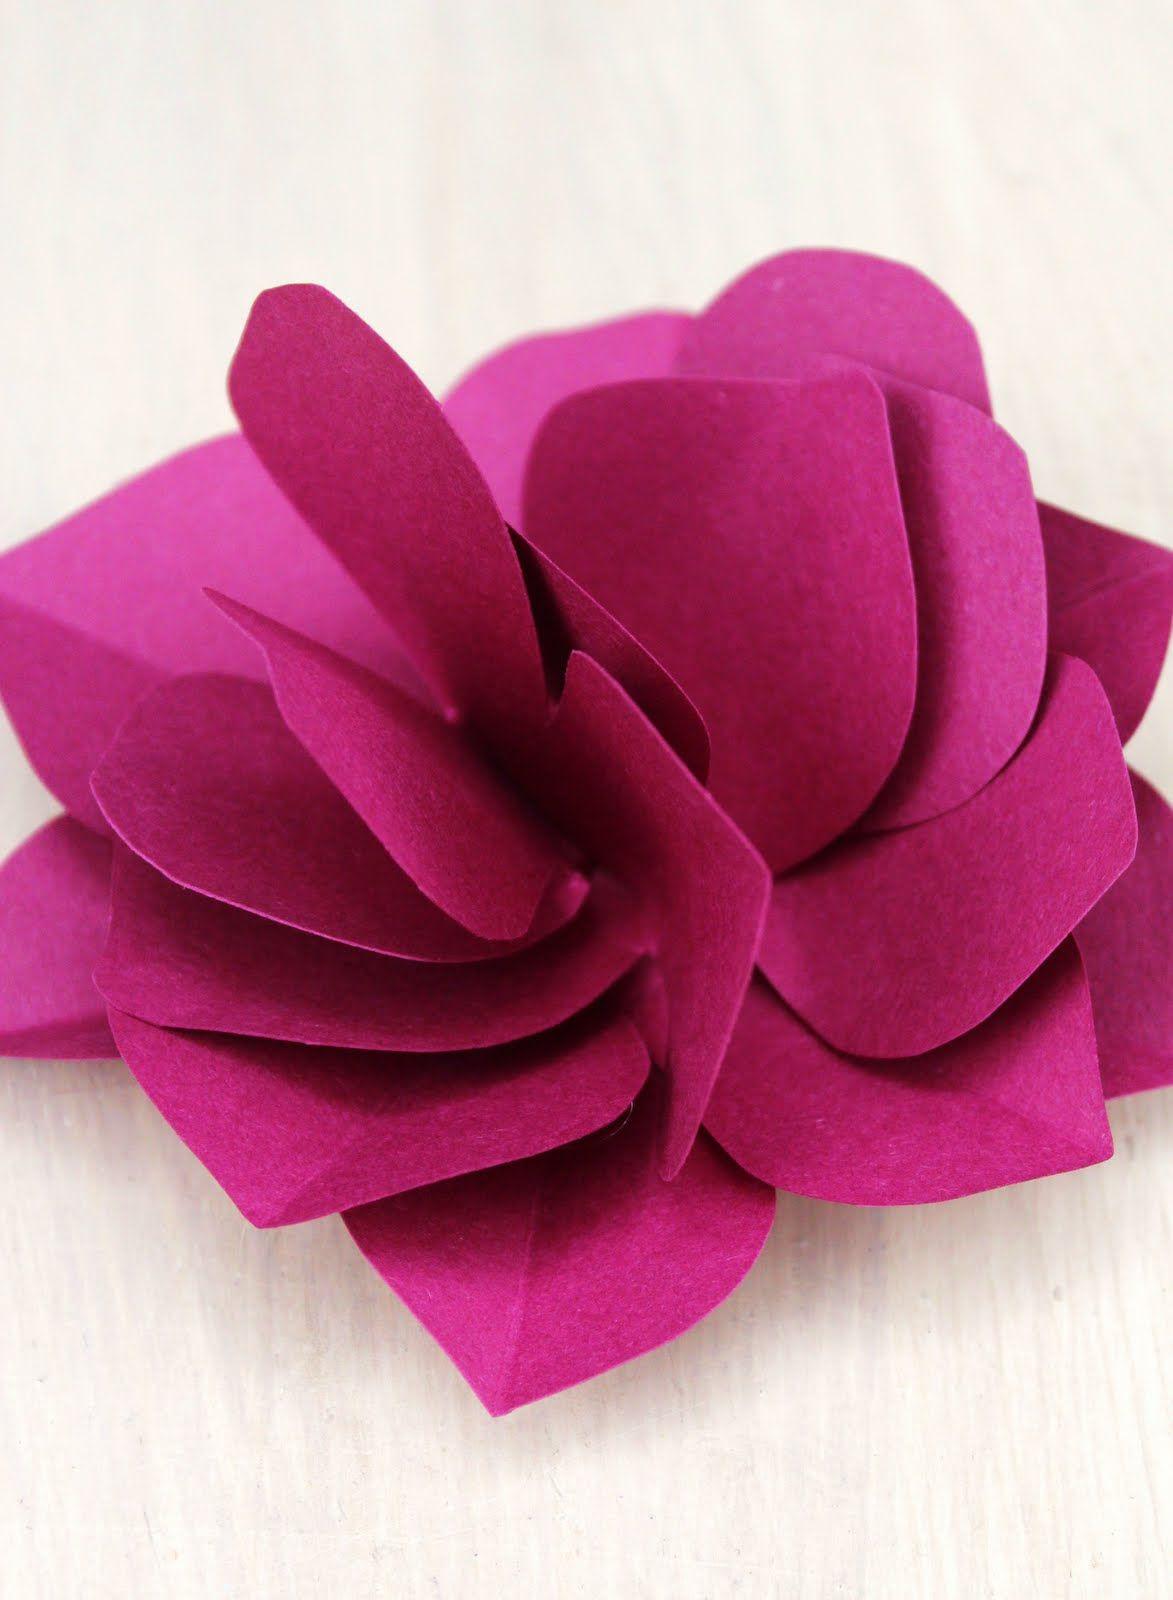 Diy Paper Flowers Manualidades Flores Pinterest Diy Paper